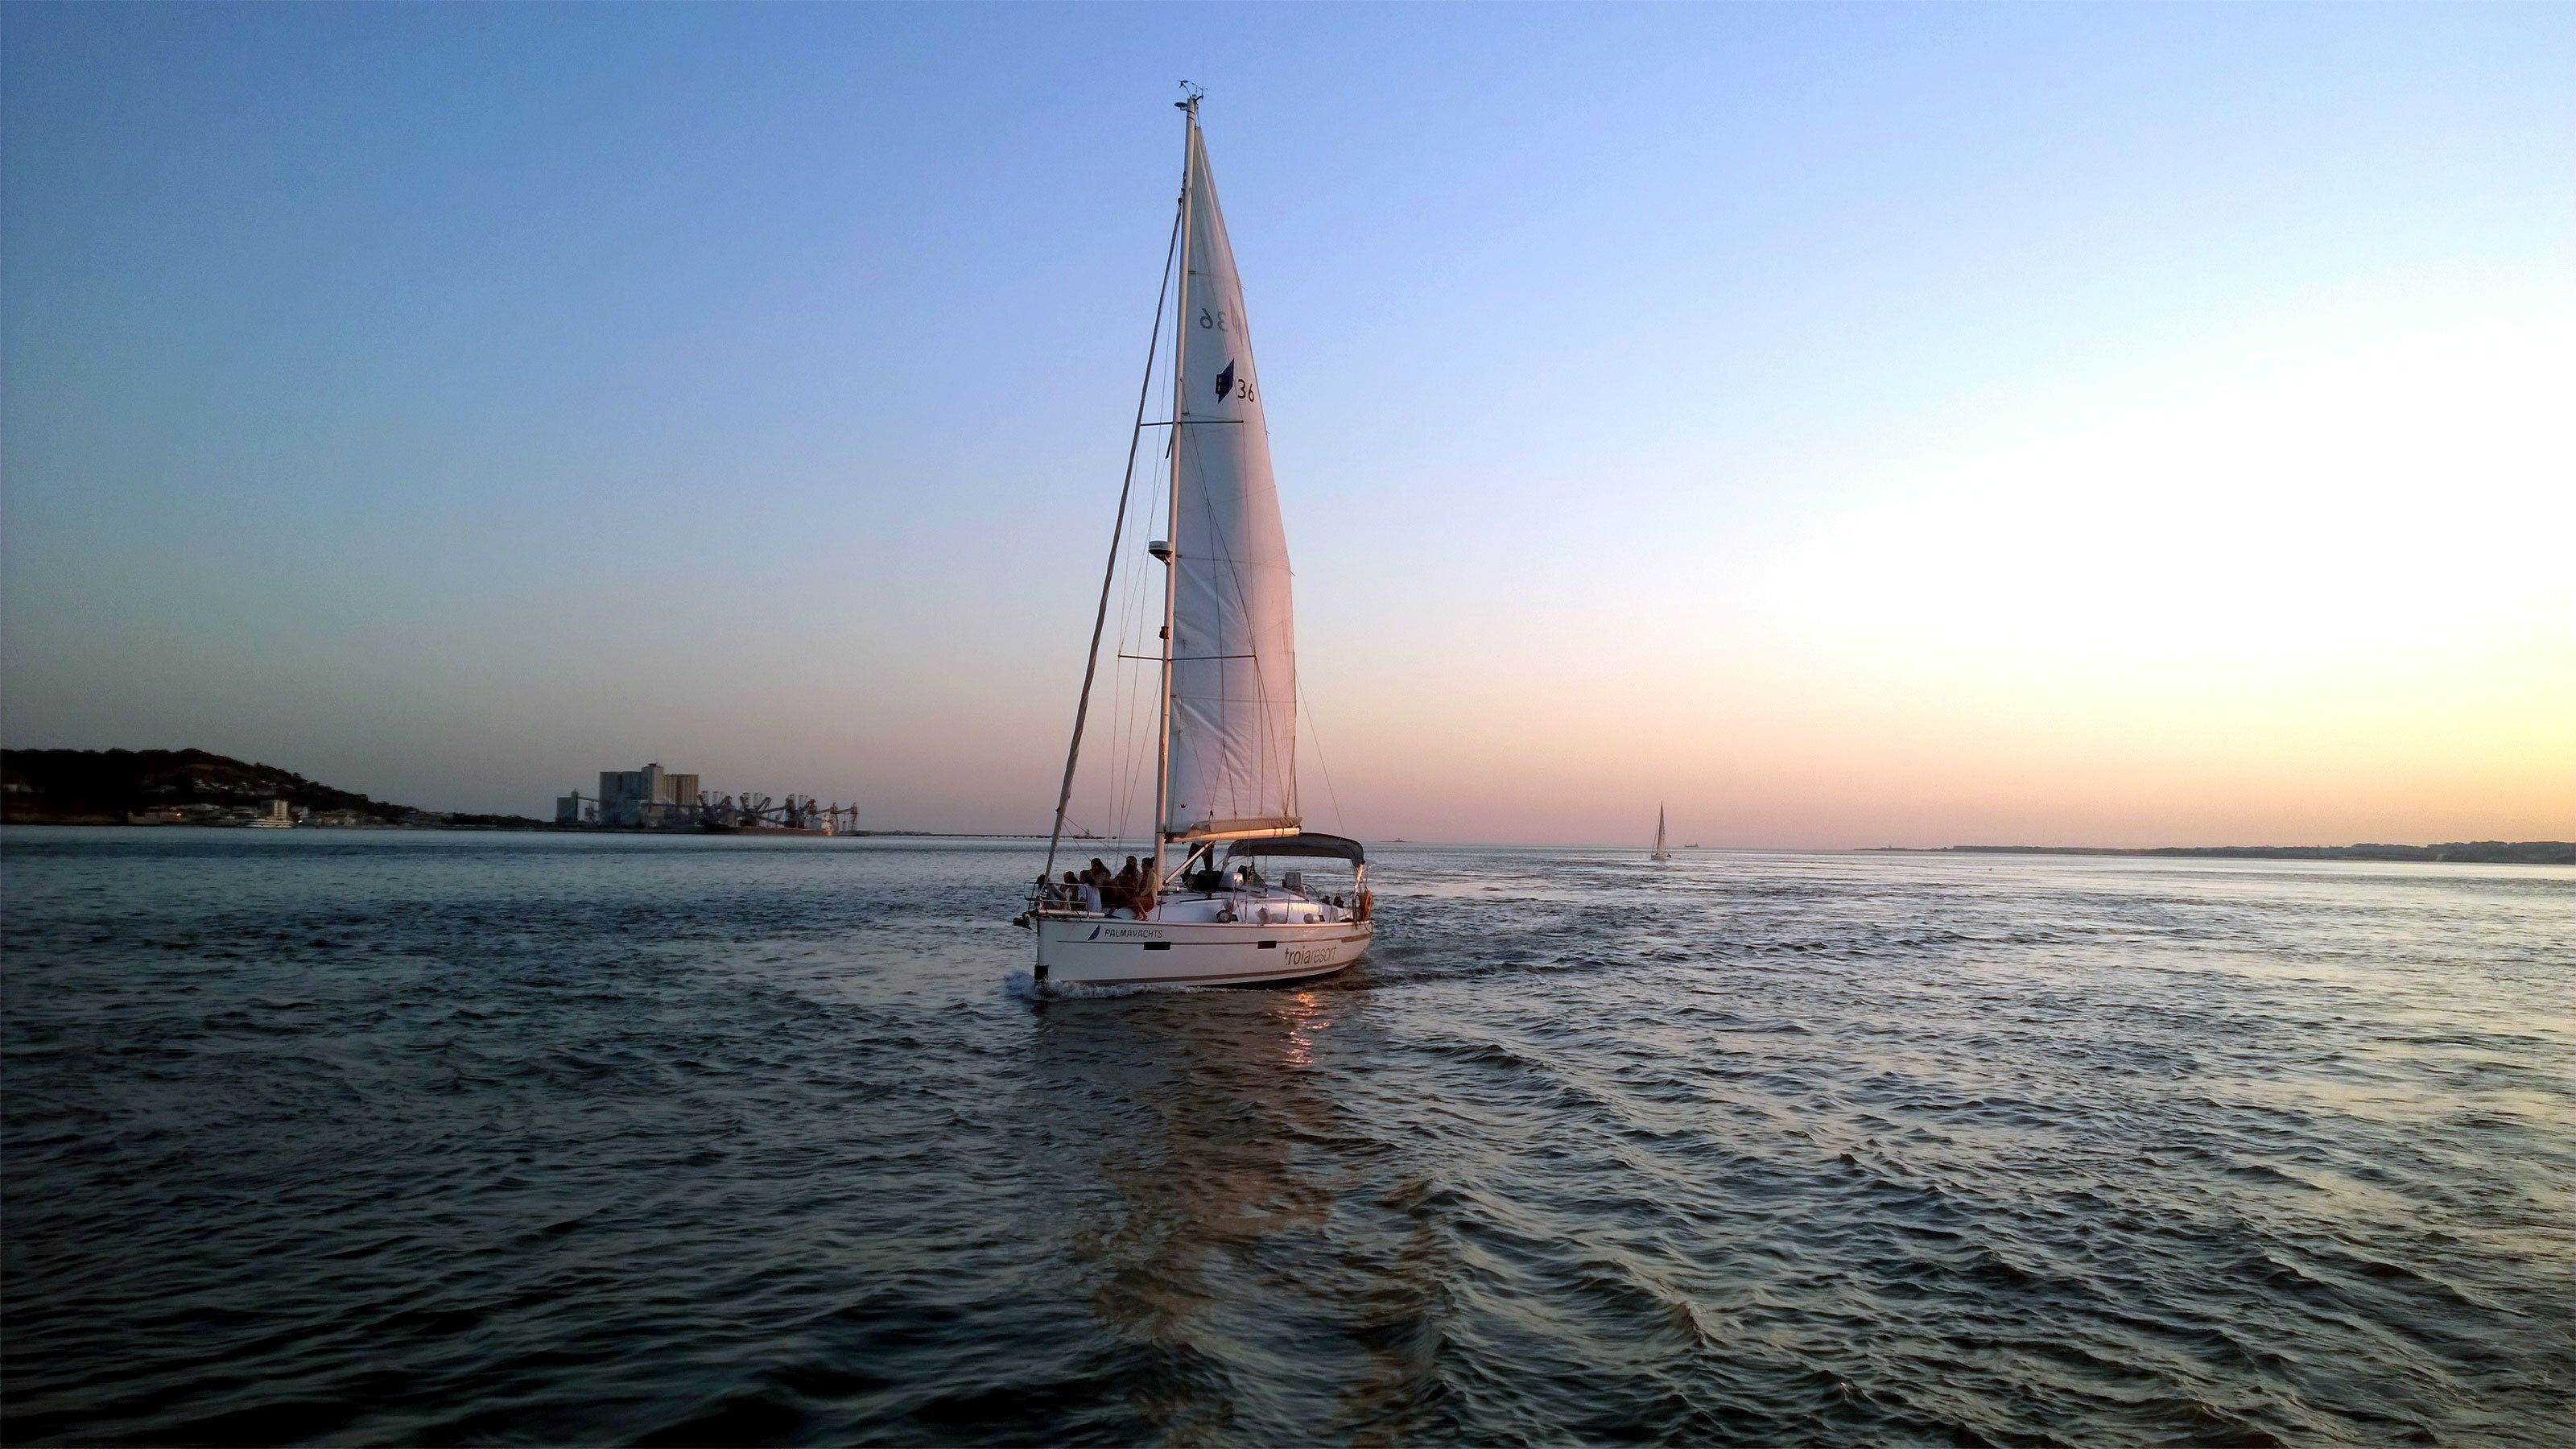 Sailboat at sunset in Lisbon